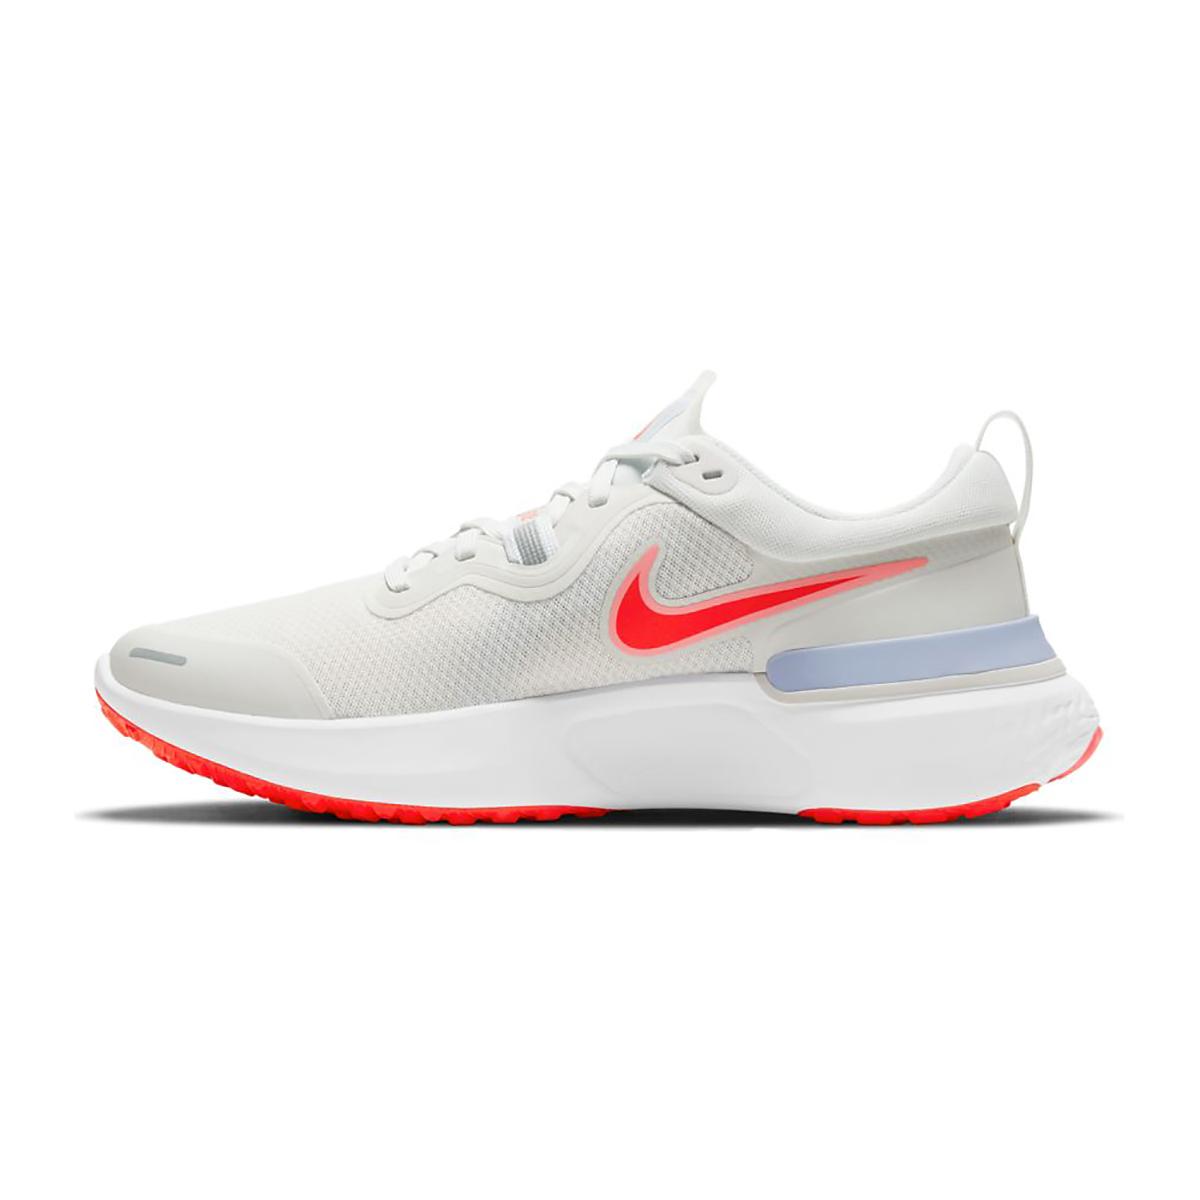 Women's Nike React Miler Running Shoe - Color: Platinum Tint/Bright Chrimson - Size: 5 - Width: Regular, Platinum Tint/Bright Chrimson, large, image 2